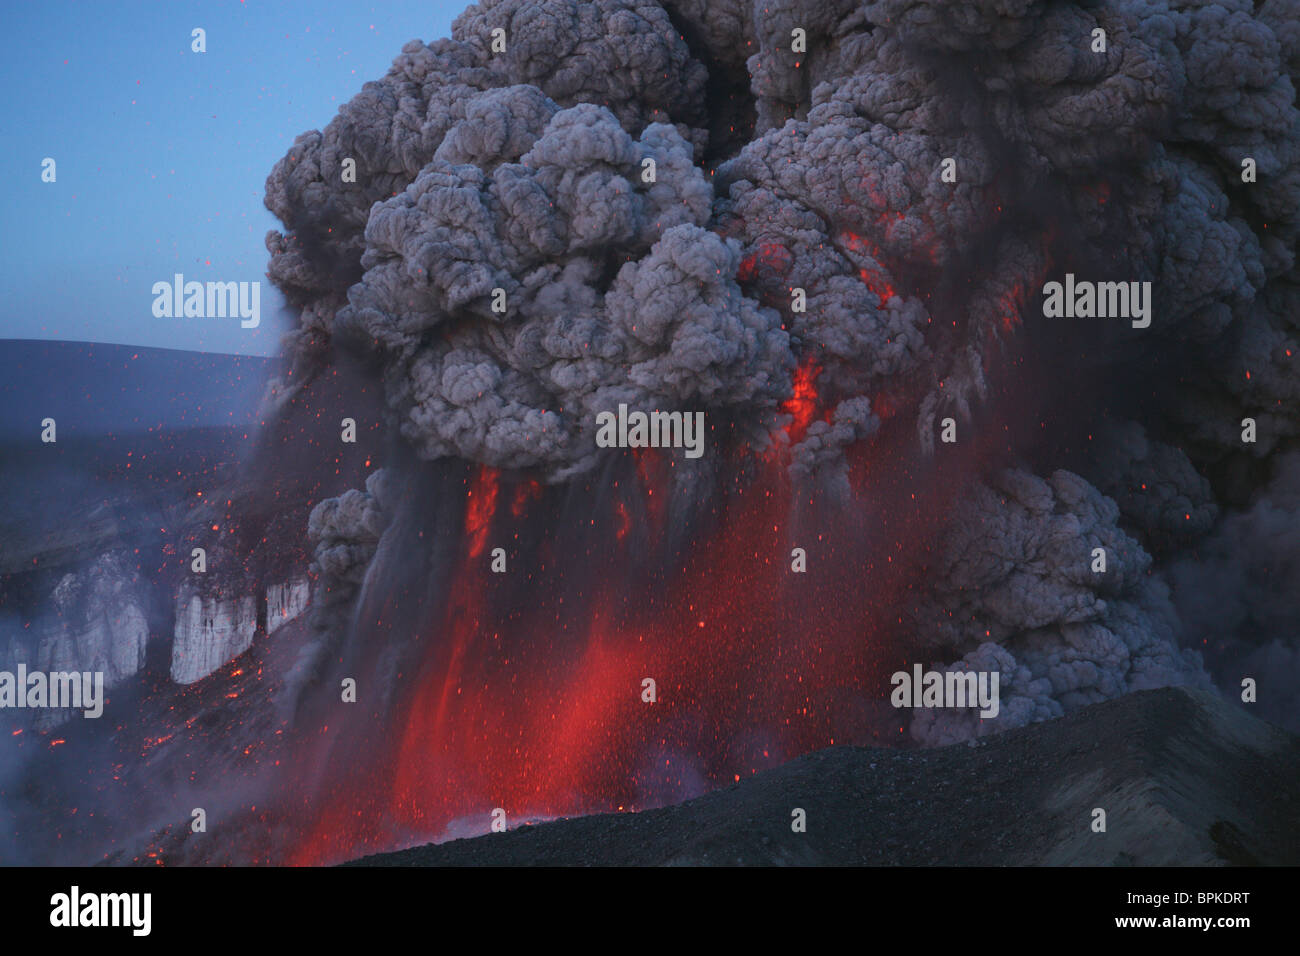 May 8, 2010 - Eyjafjallajökull eruption, Summit crater, Iceland. - Stock Image